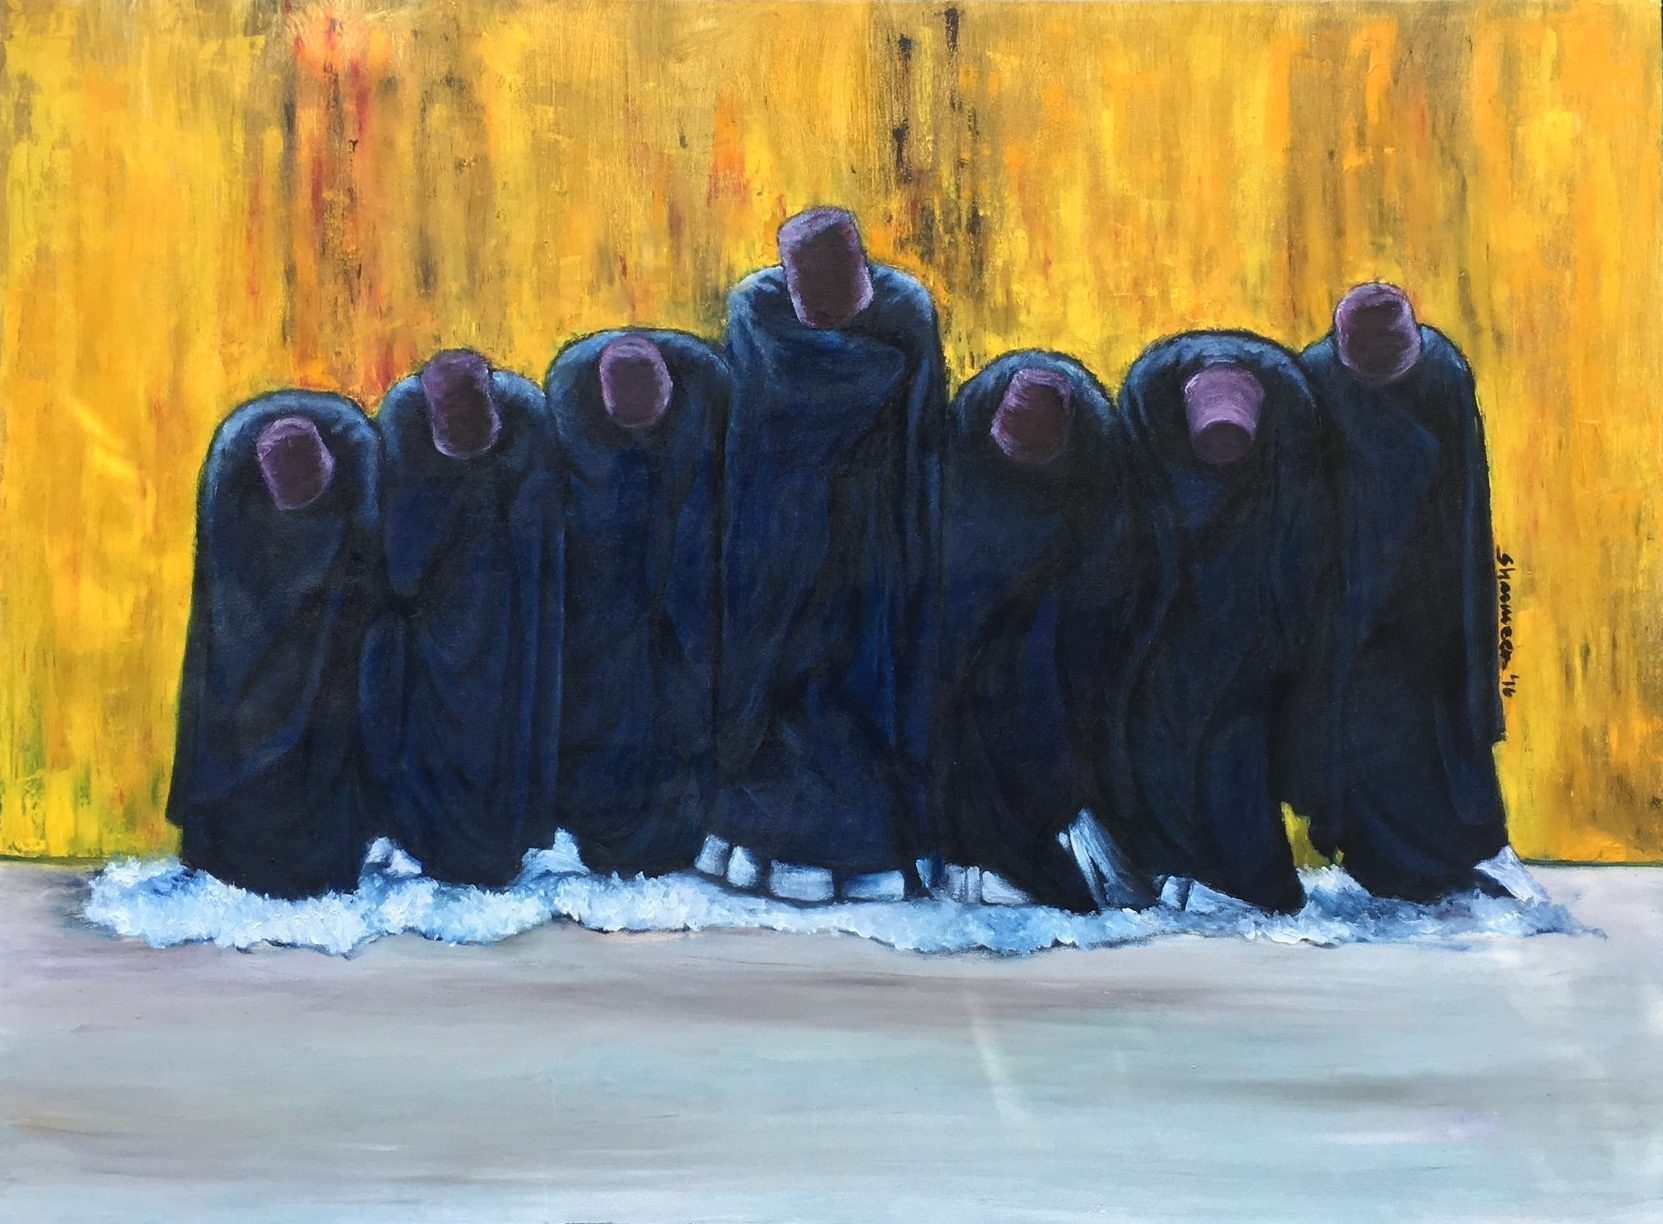 The Semazens - 2016. Oil on Canvas. 35.5